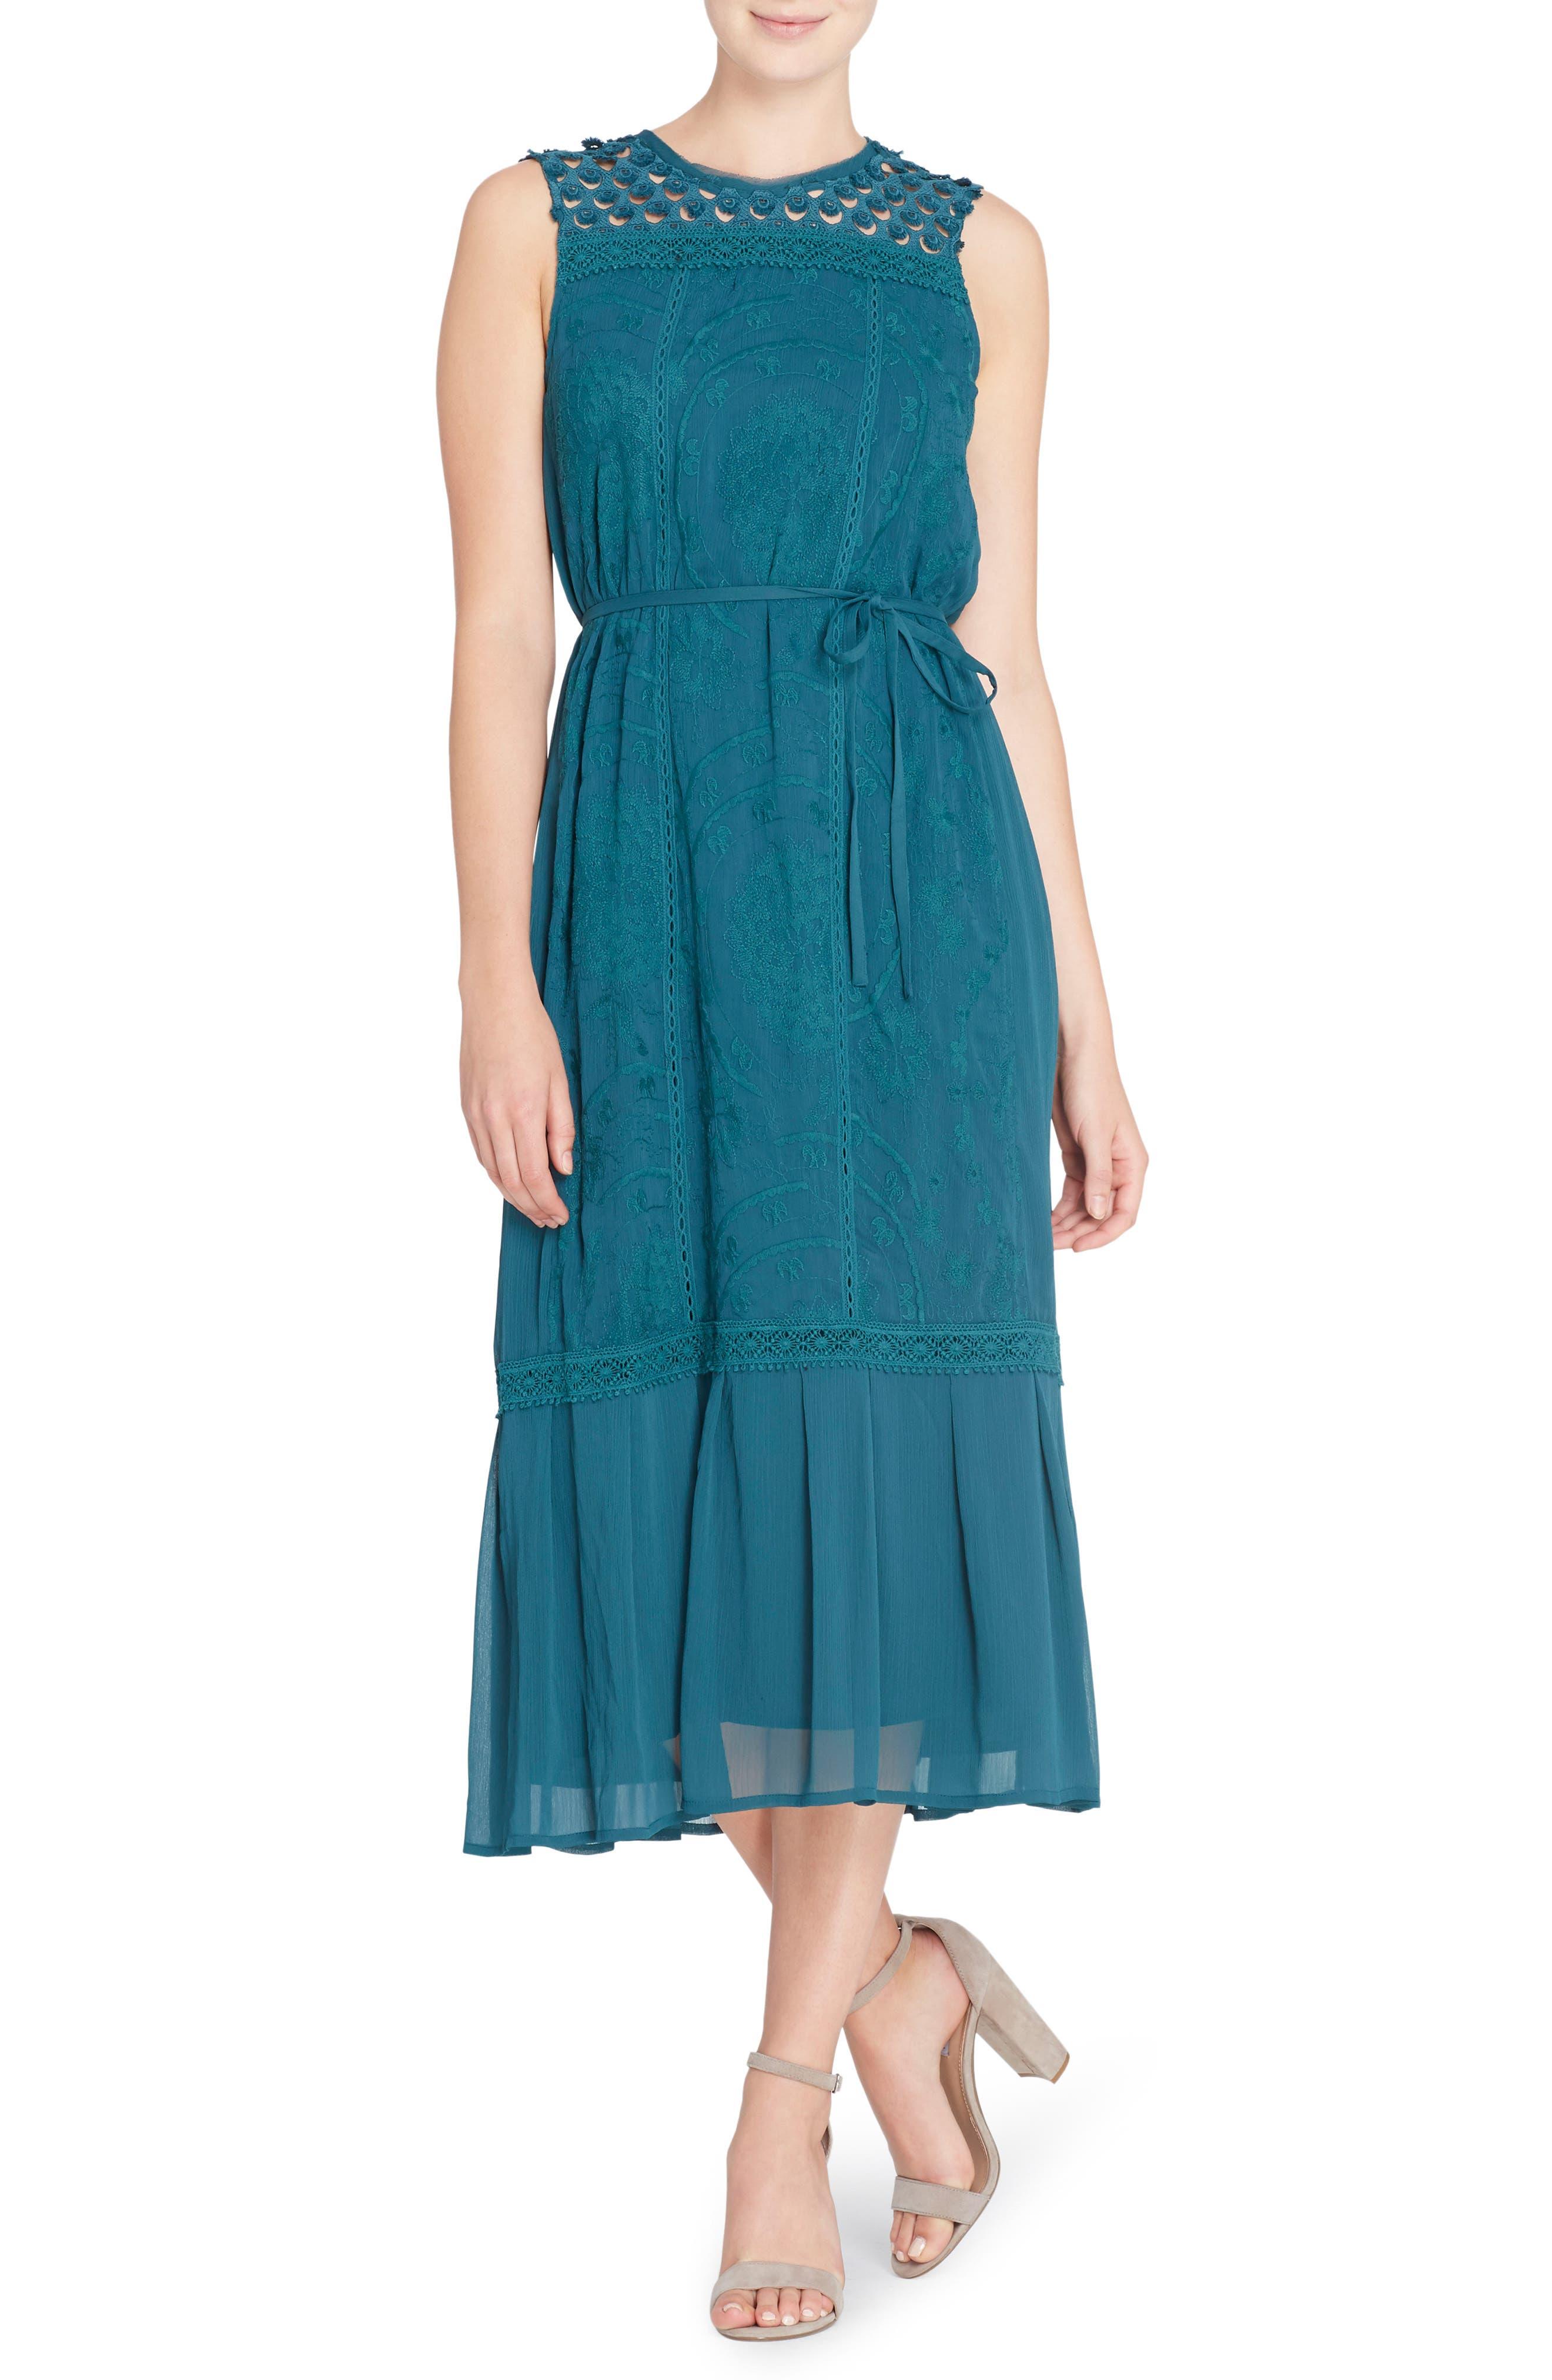 Alternate Image 1 Selected - Catherine Catherine Malandrino Ellen Embroidered Midi Dress